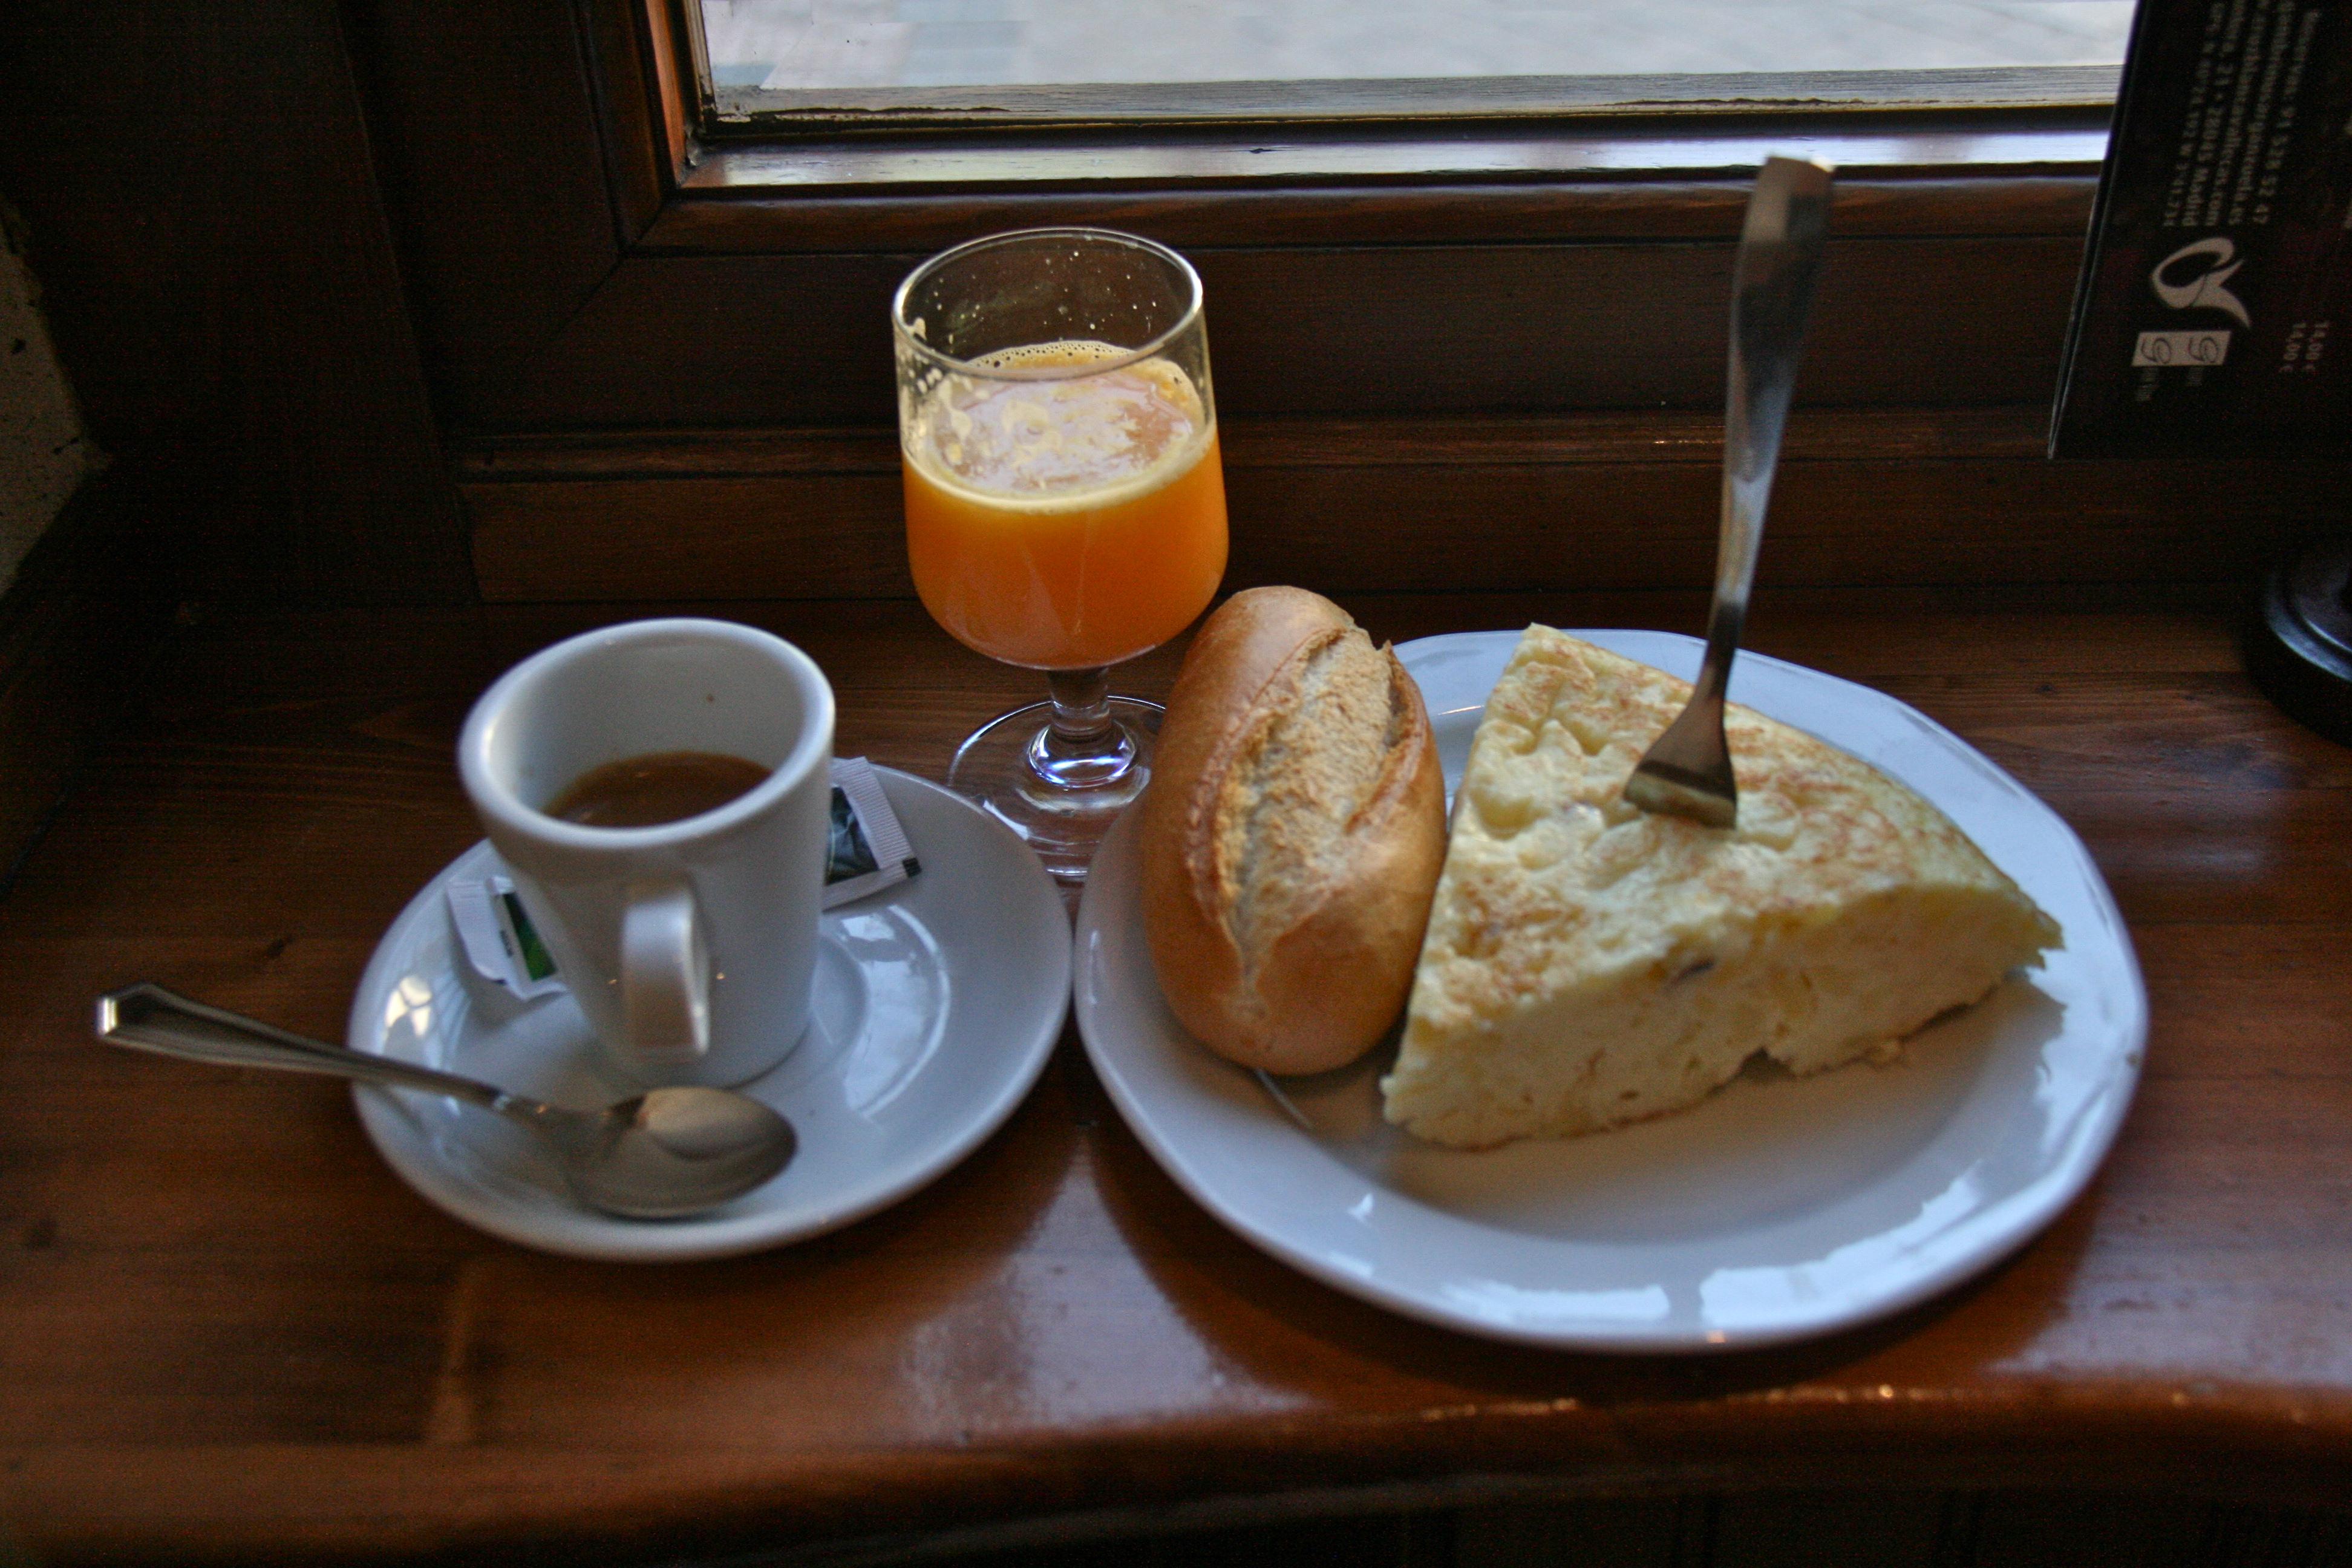 Solo Cafe De Calidad S De Rl De Cv